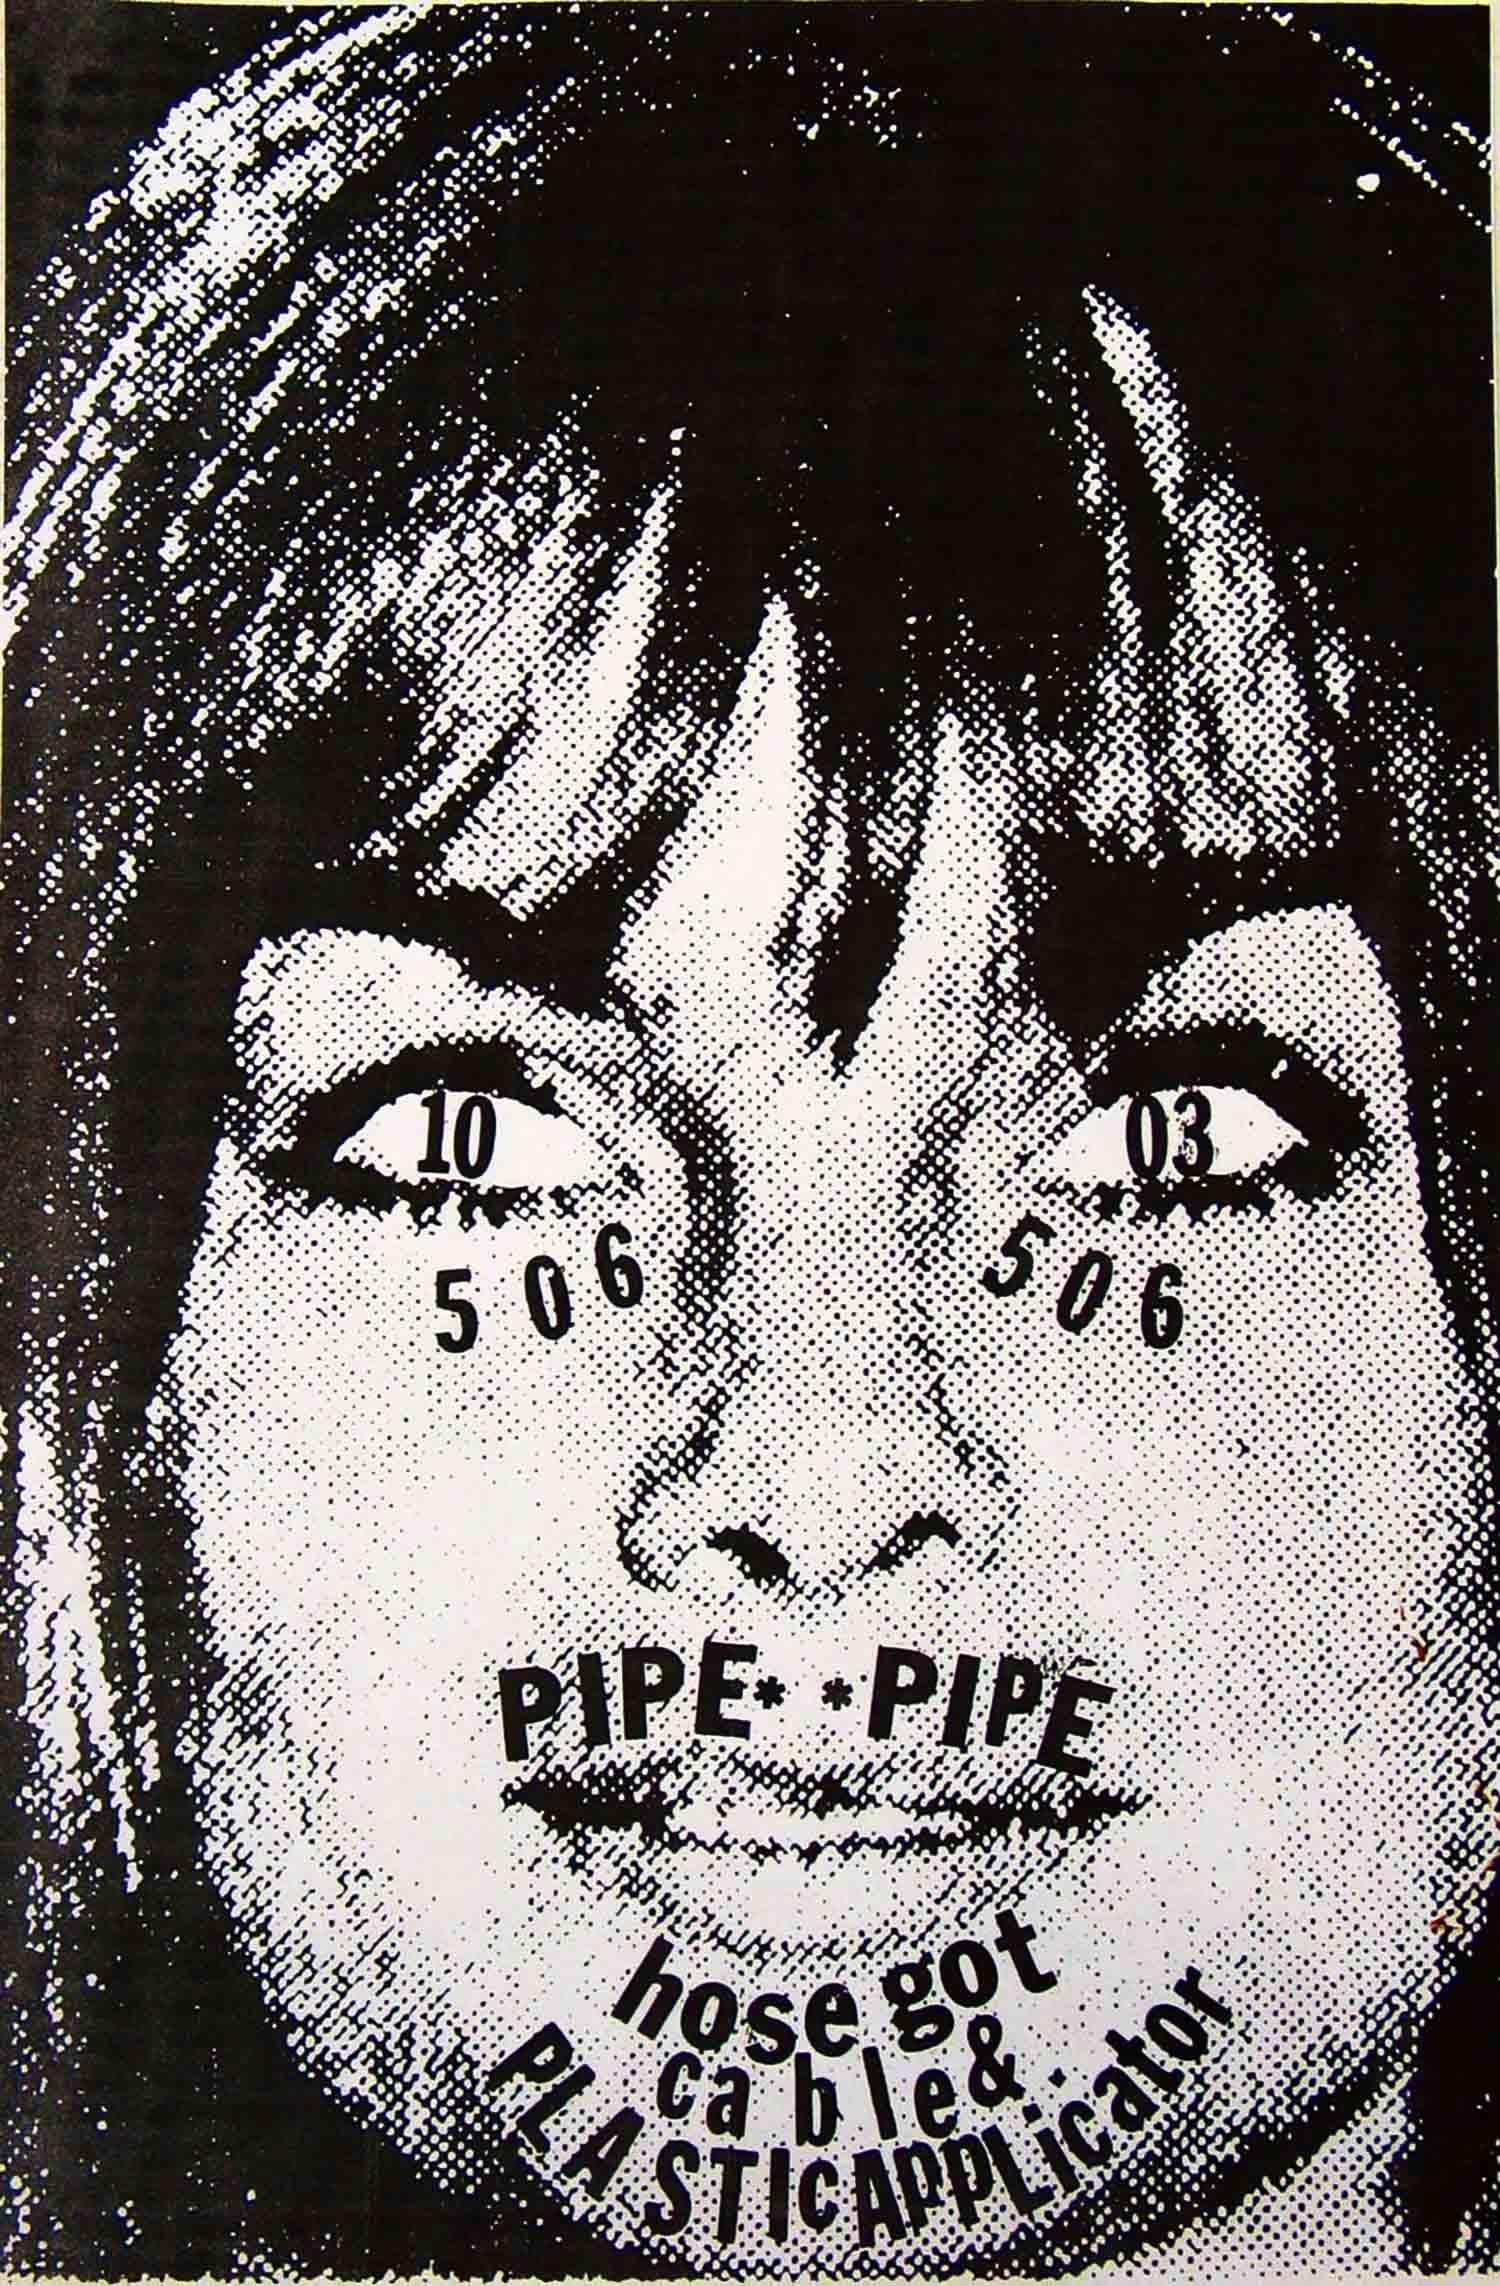 Pipe - Hose Got Cable - Plastic Applicator